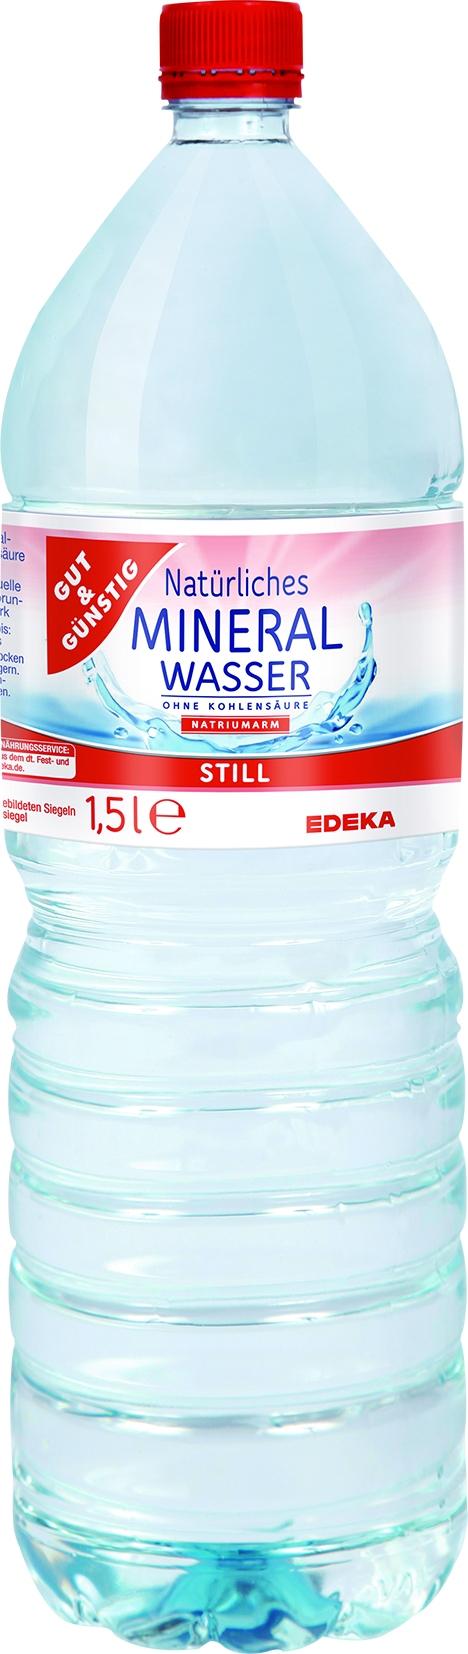 Mineralwasser Still PET